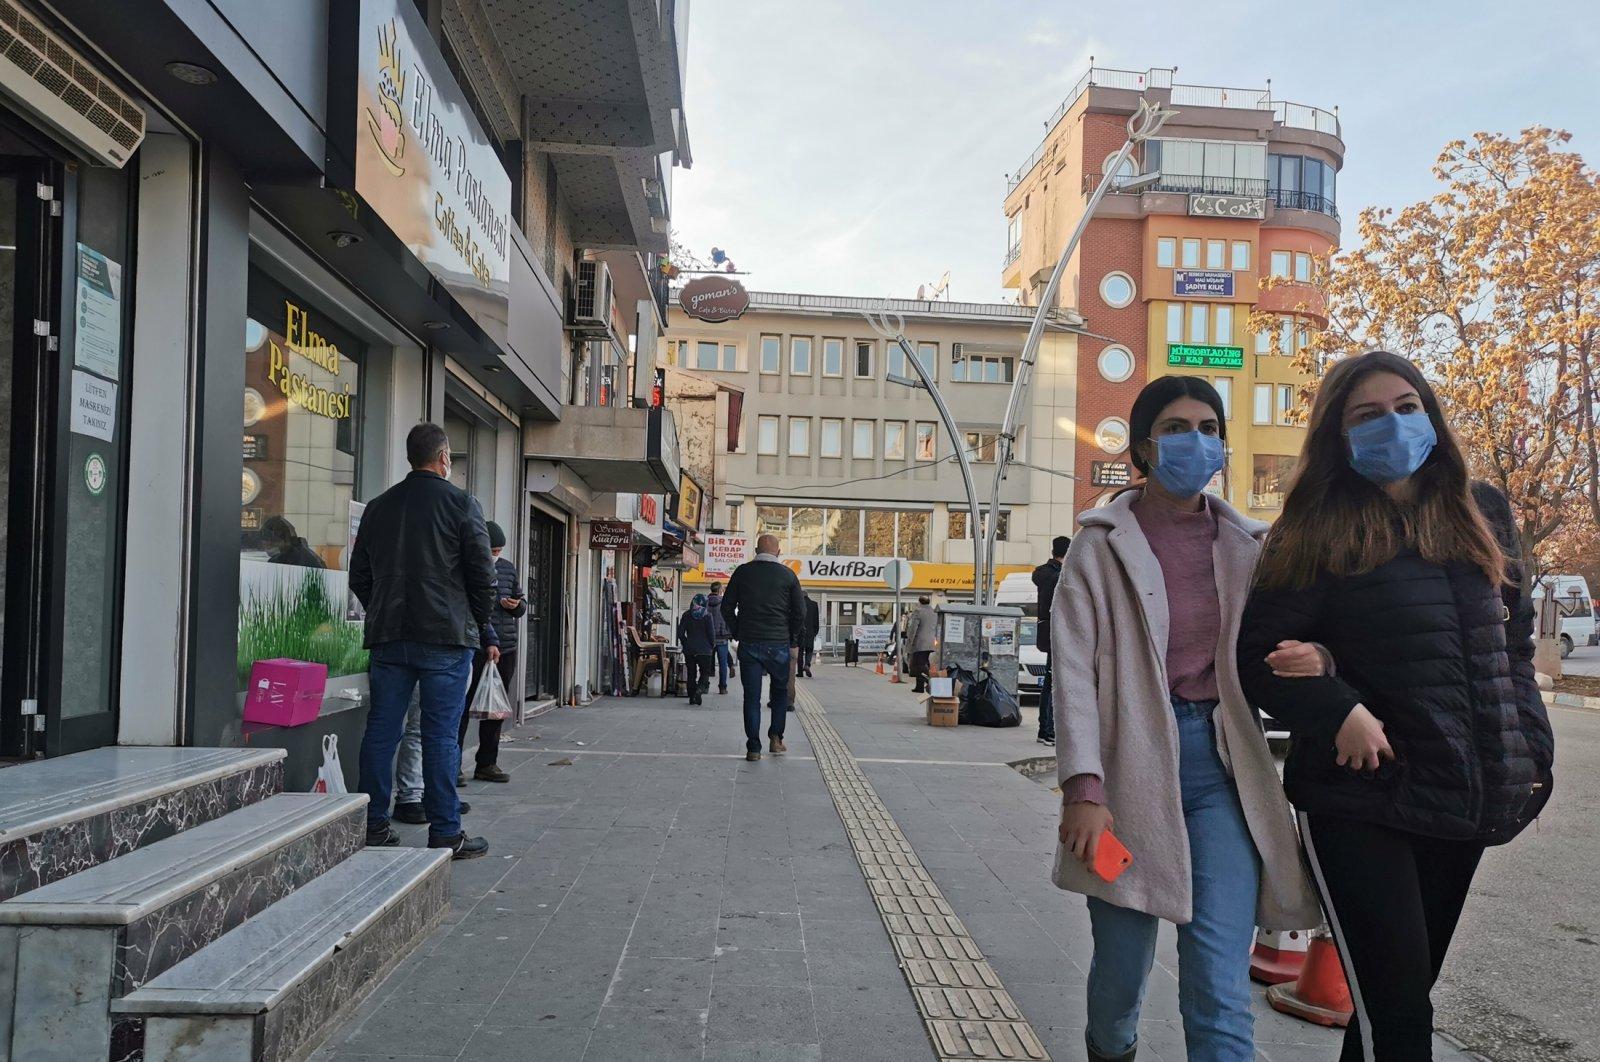 People wearing protective masks walk on a street in Tunceli, eastern Turkey, Jan. 8, 2021. (DHA Photo)